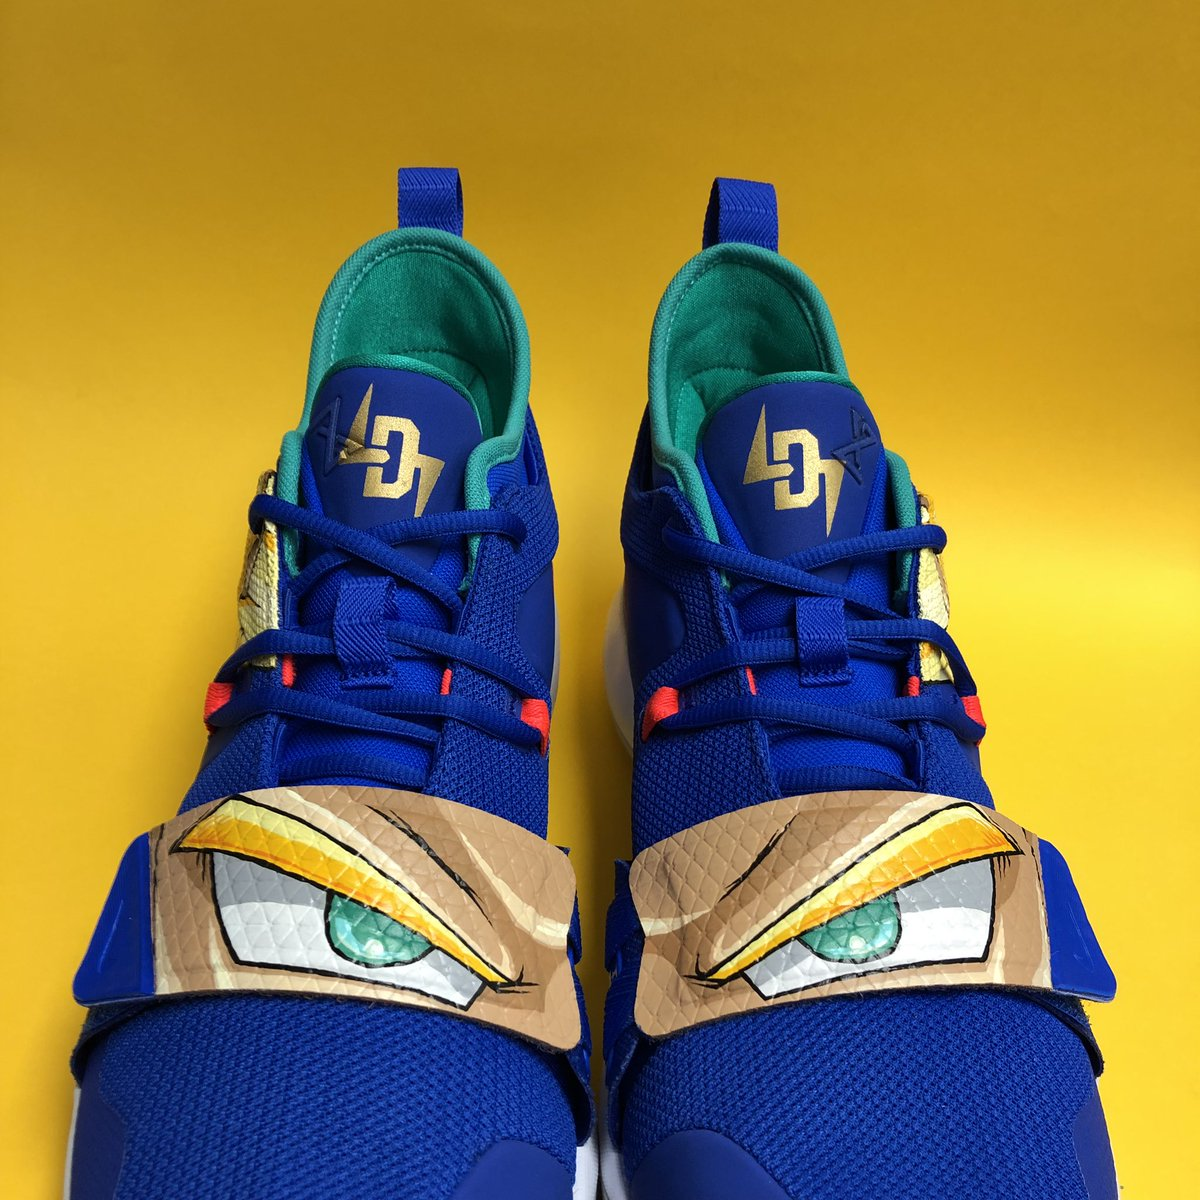 luka doncic custom shoes